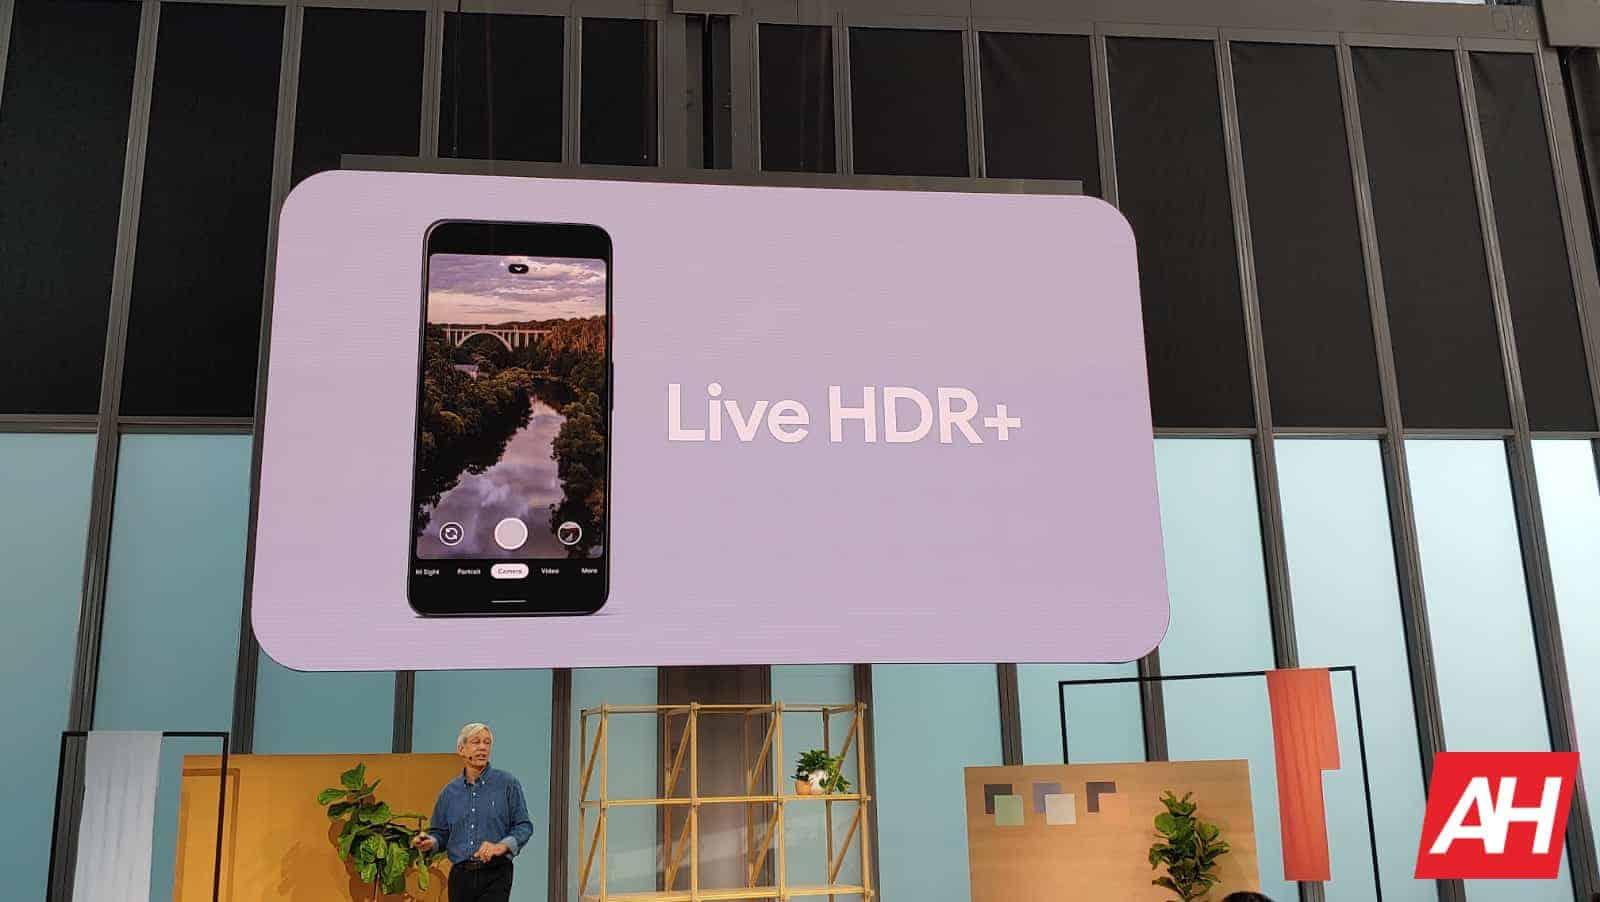 Pixel 4 camera features 3